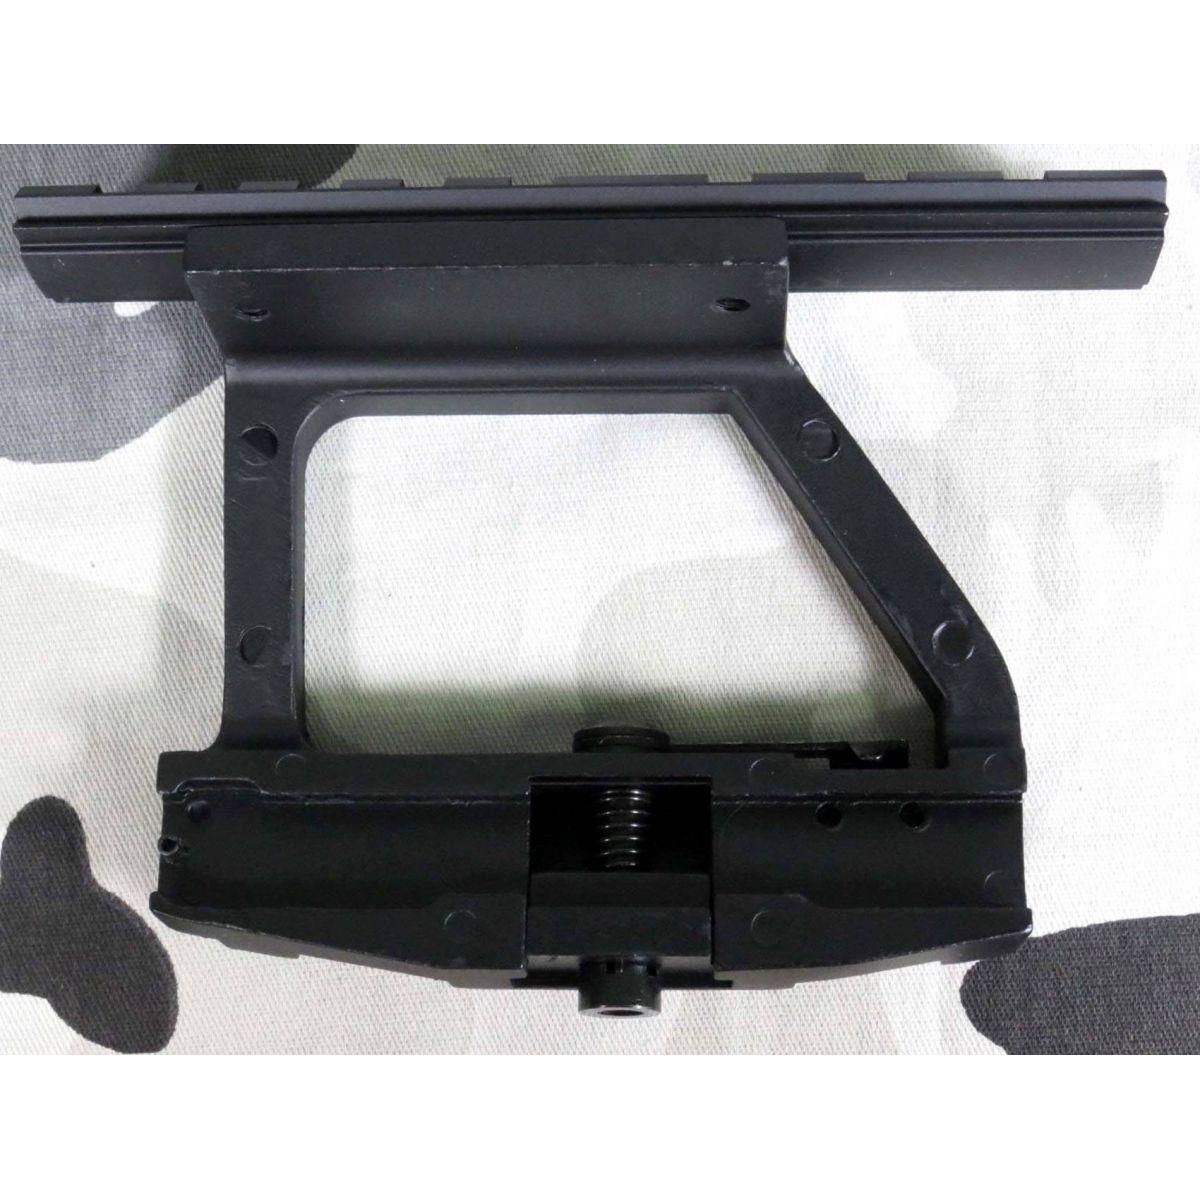 Trilho superior para AK-47  - MAB AIRSOFT